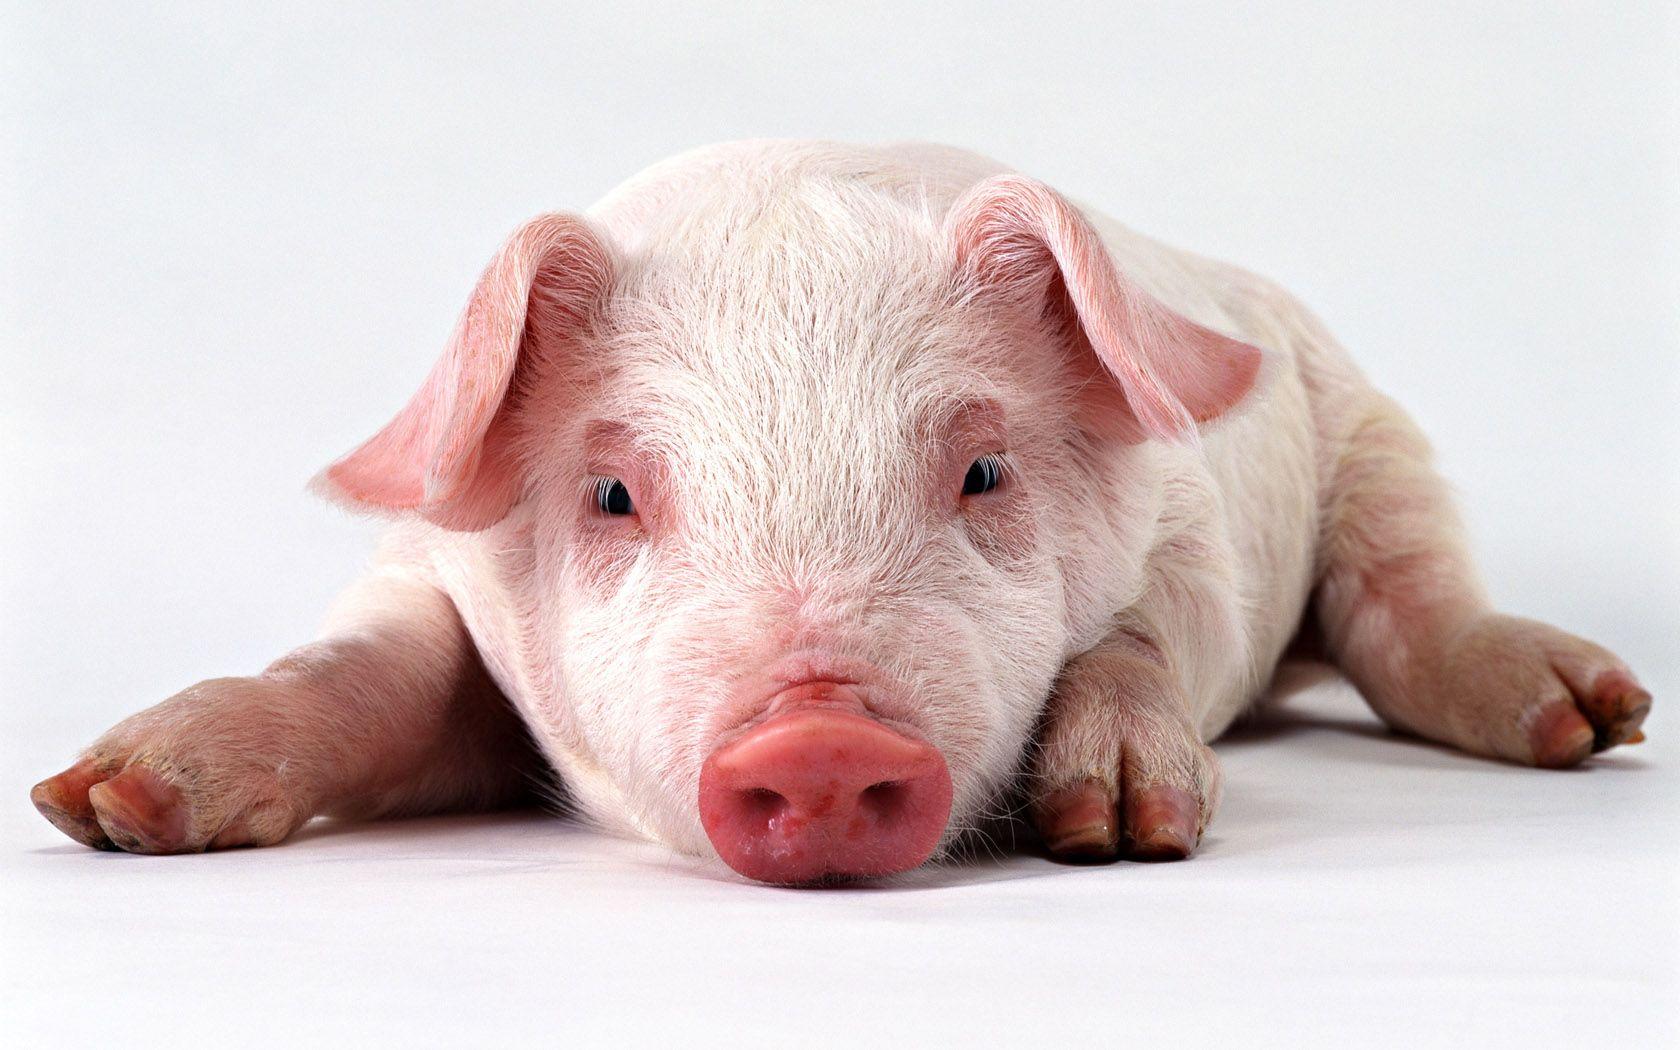 Download Pigs Wallpaper 1680x1050 Wallpoper 395315 1680x1050